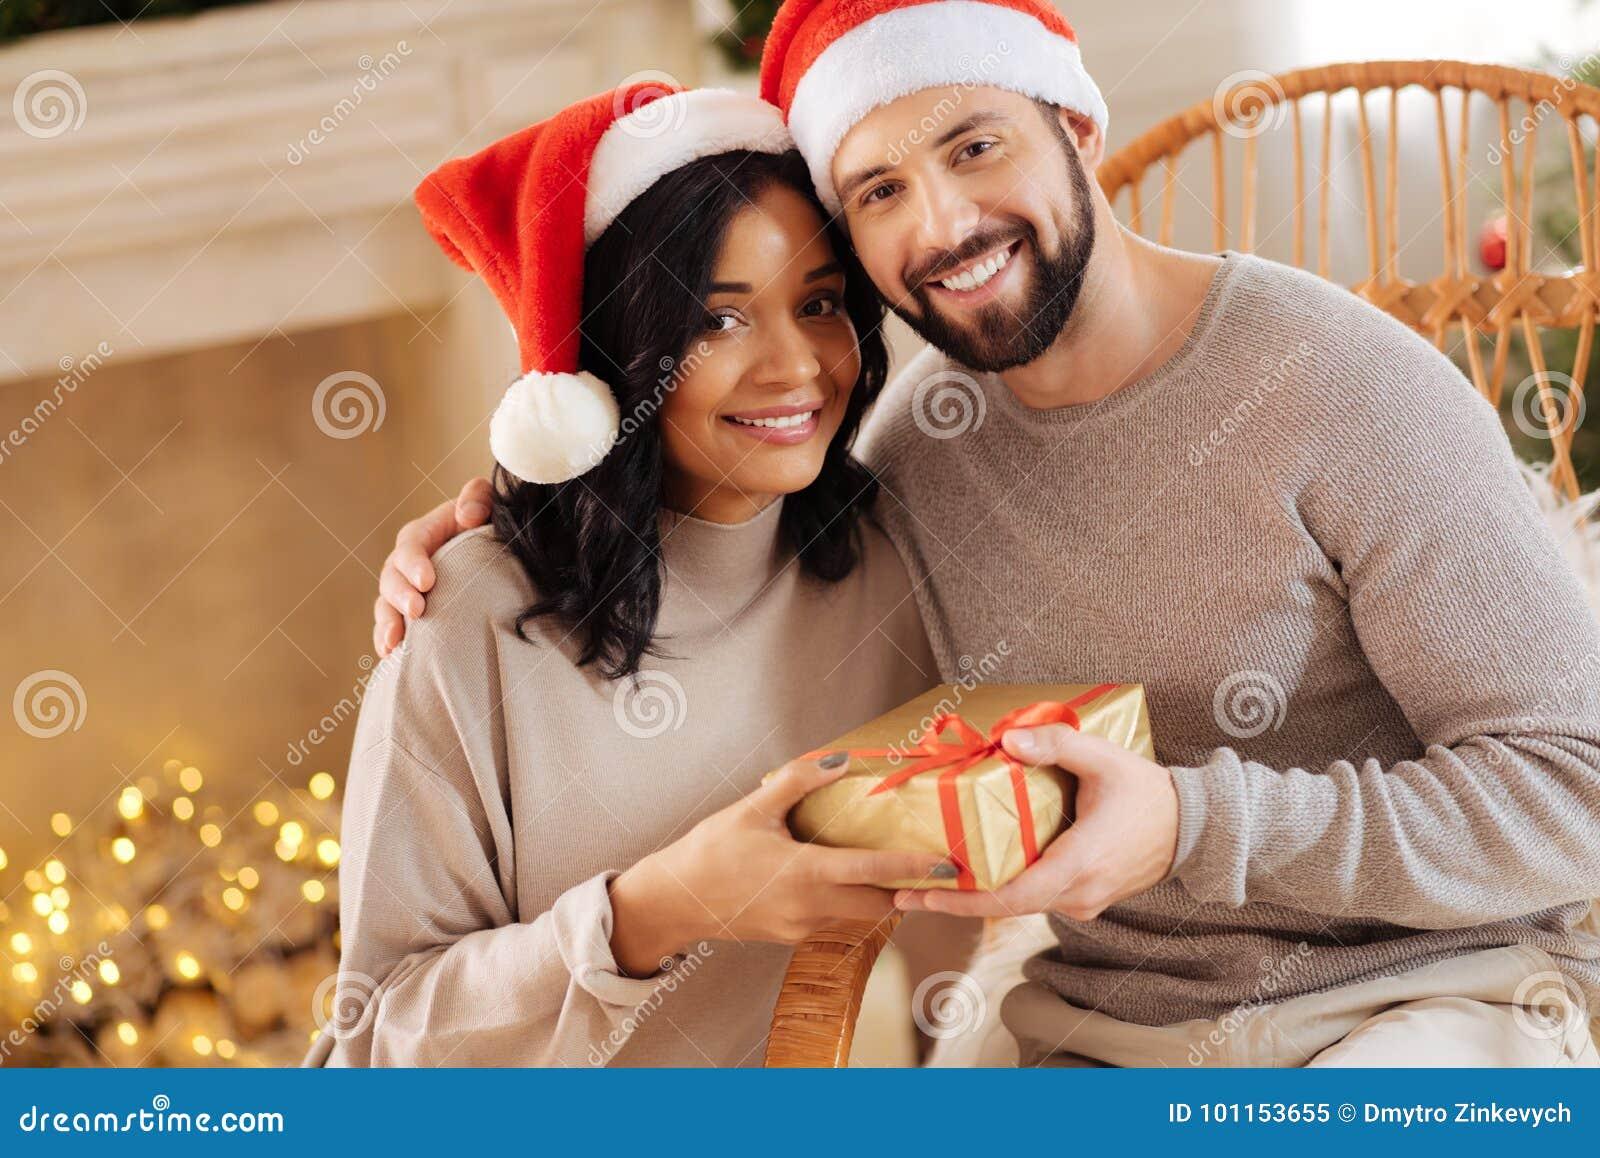 https://thumbs.dreamstime.com/z/happy-international-couple-posing-christmas-present-celebrating-together-beautiful-happy-international-couple-posing-101153655.jpg